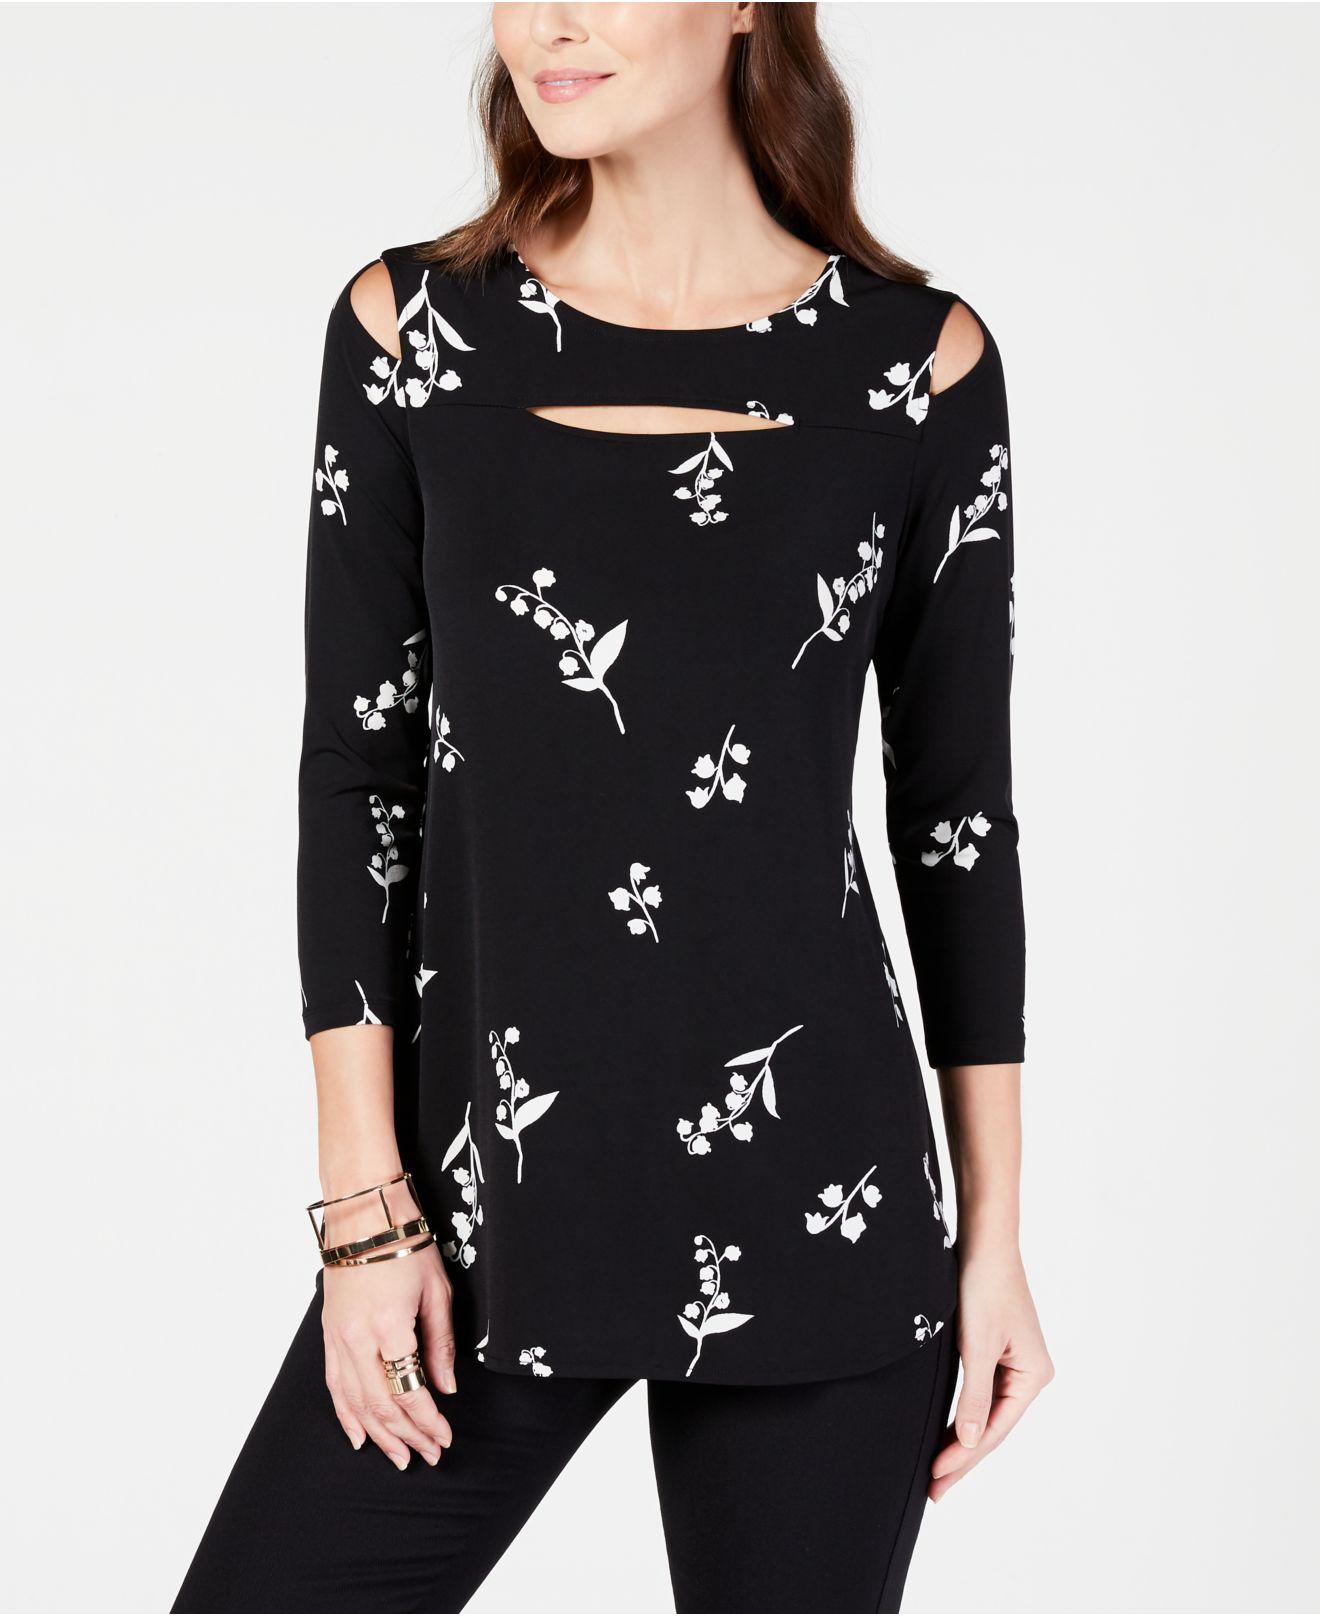 d918d02cf75e5 Alfani. Women s Black Printed Cutout Tunic